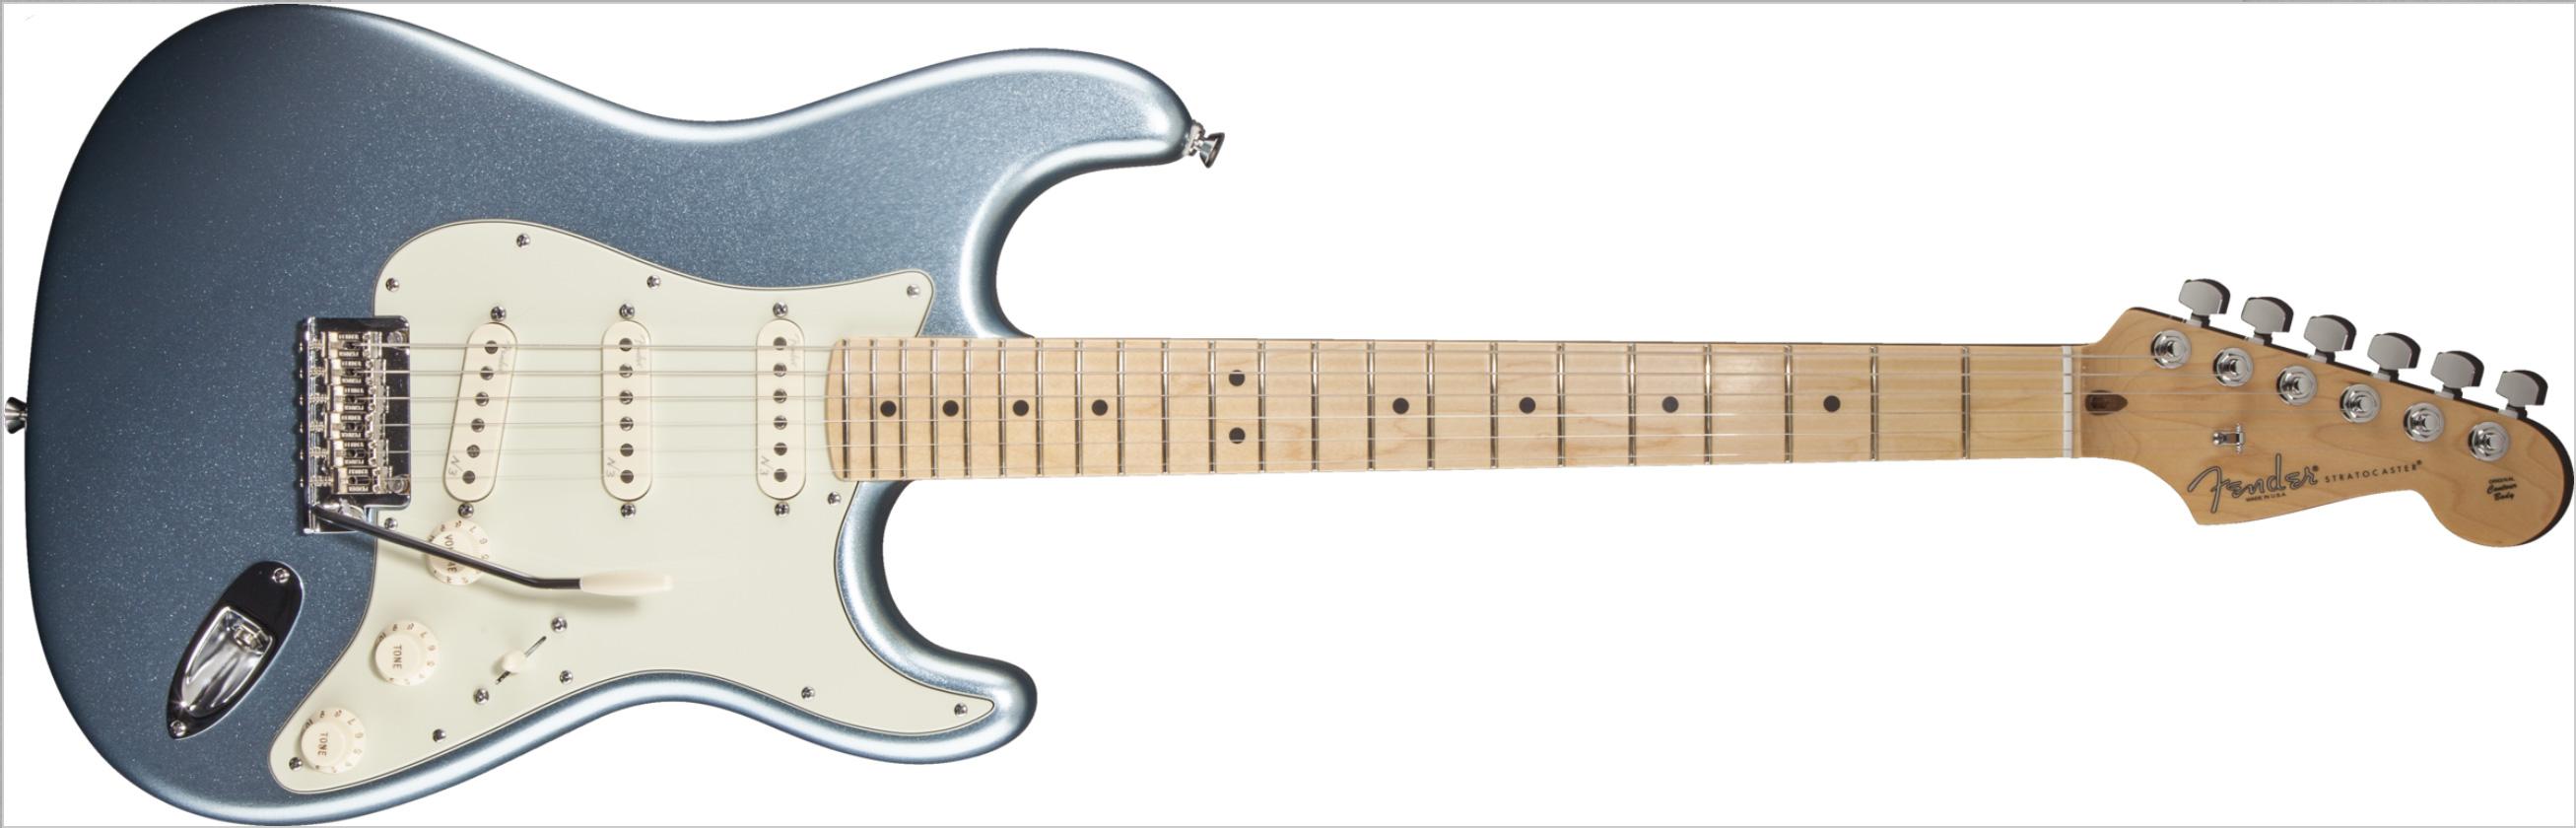 Nammvideo Fender American Deluxe Strat Plus News Audiofanzine Master Tone Stratocaster Guitar Forum